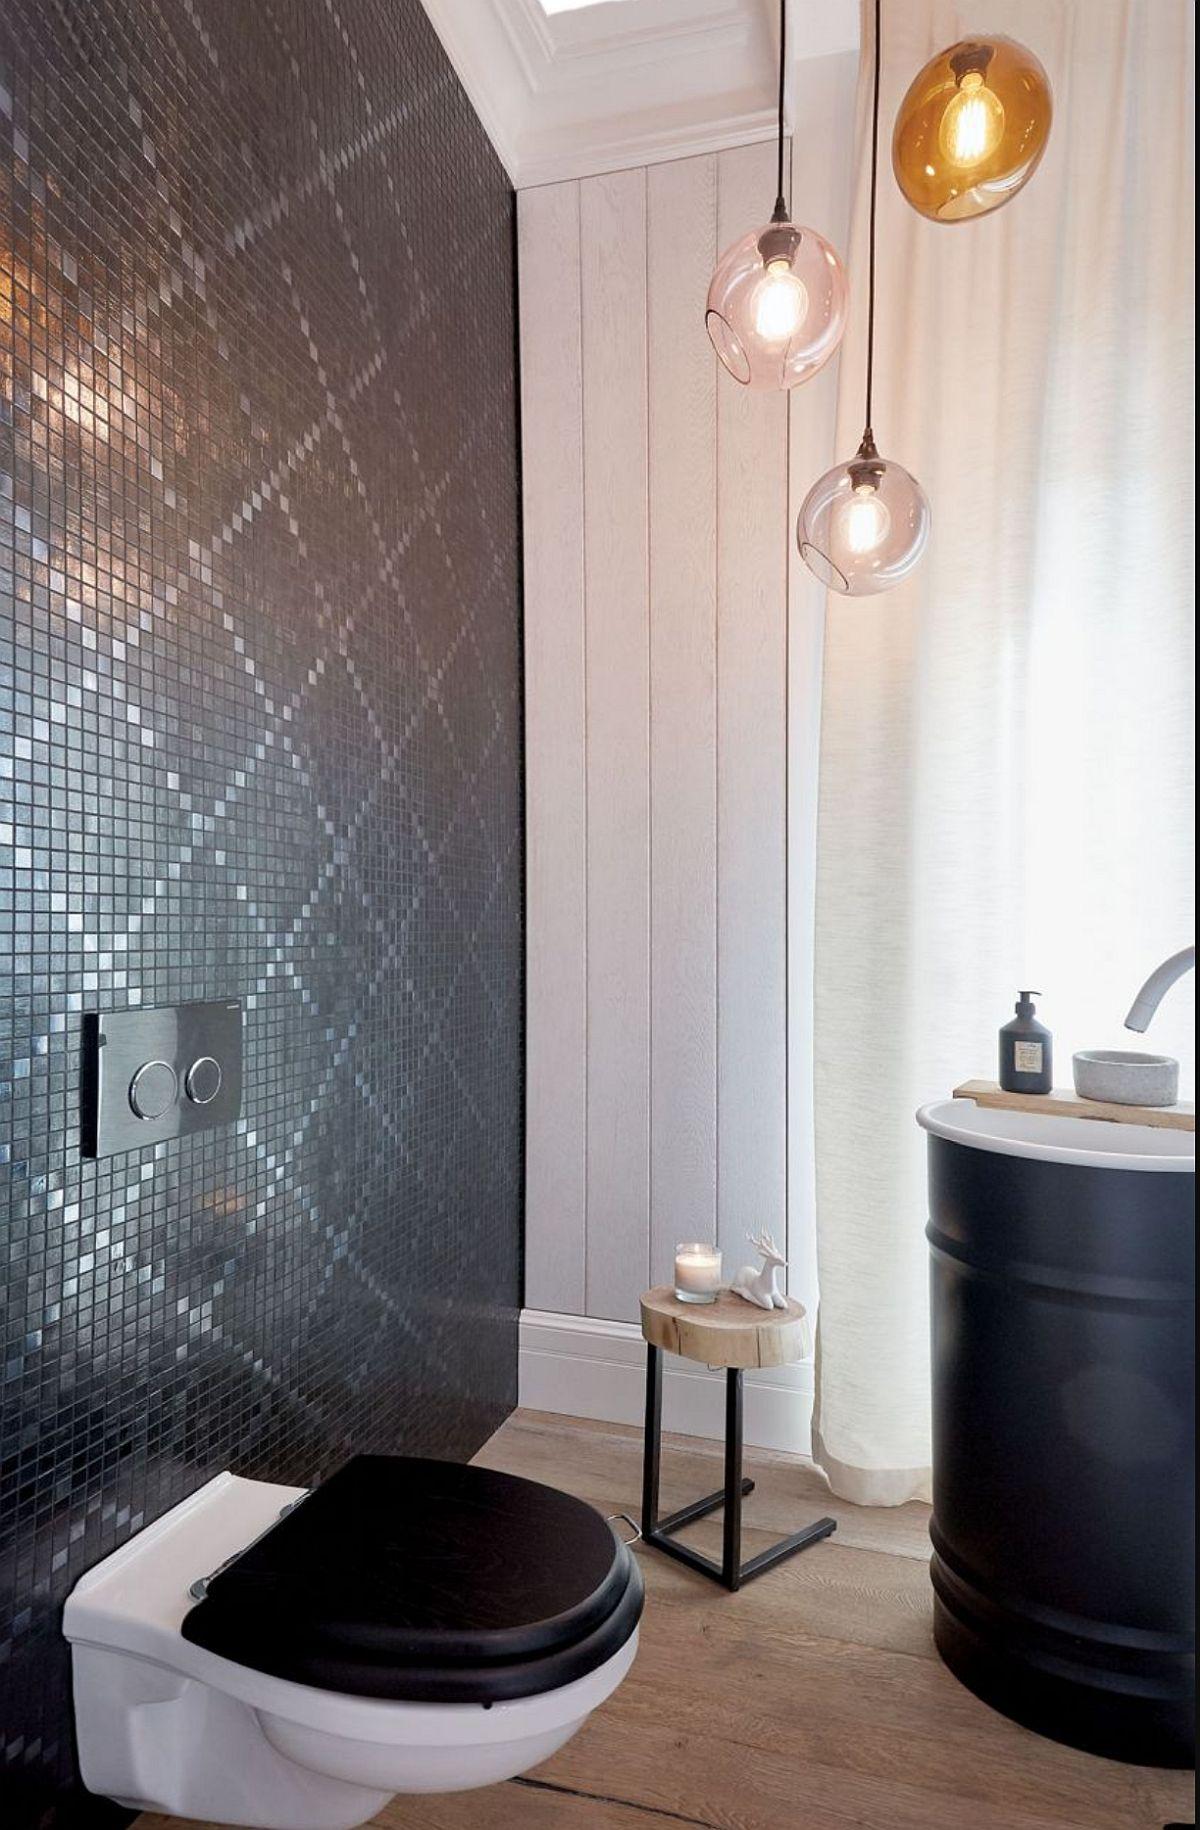 adelaparvu.com despre amenajare casa in stil eclectic, design Mana Design, Foto Tomirri Photography (16)